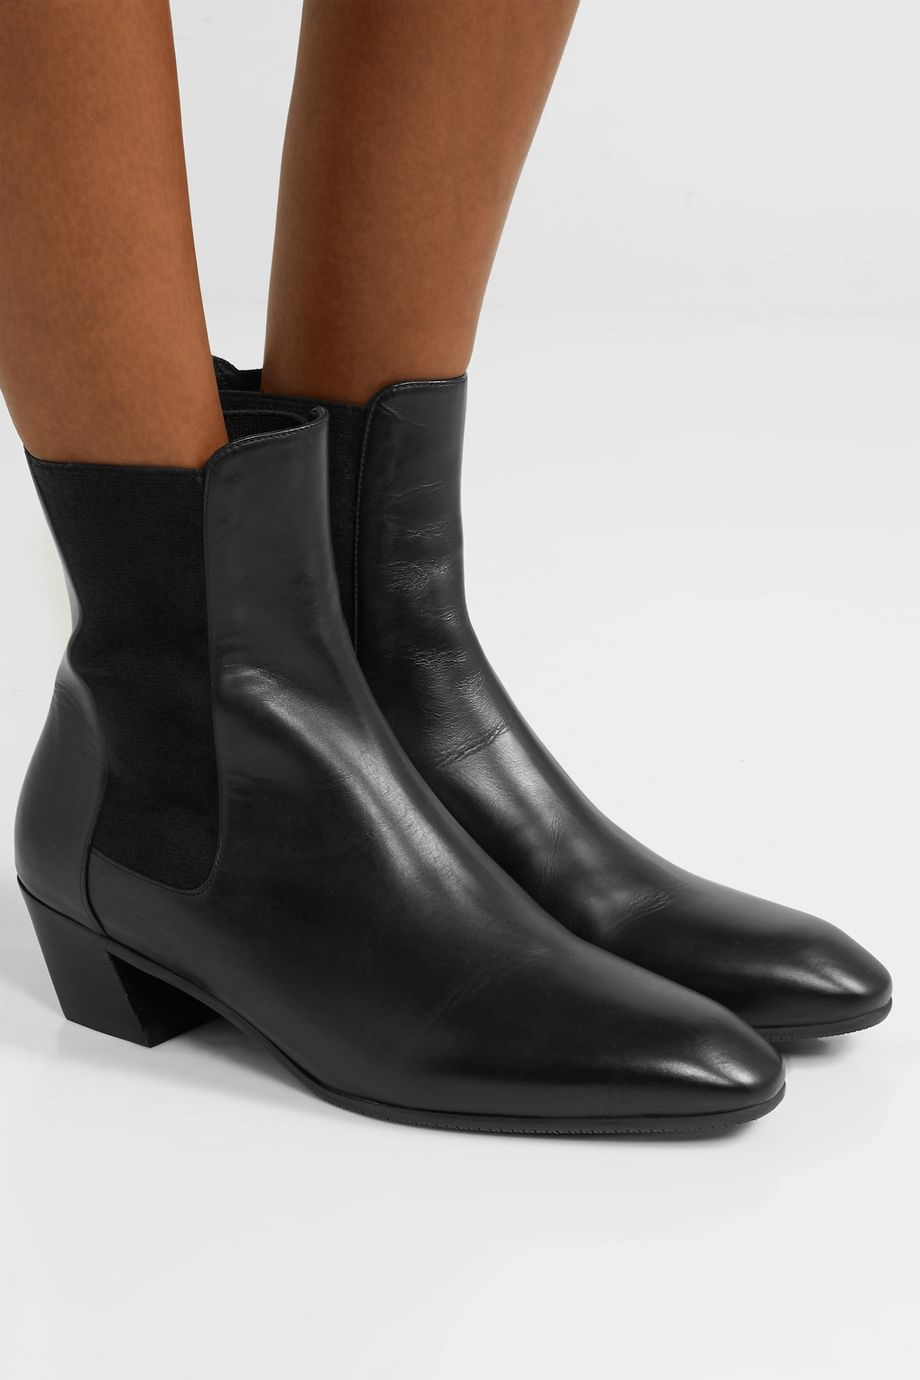 Stuart Weitzman Cleora leather Chelsea boots